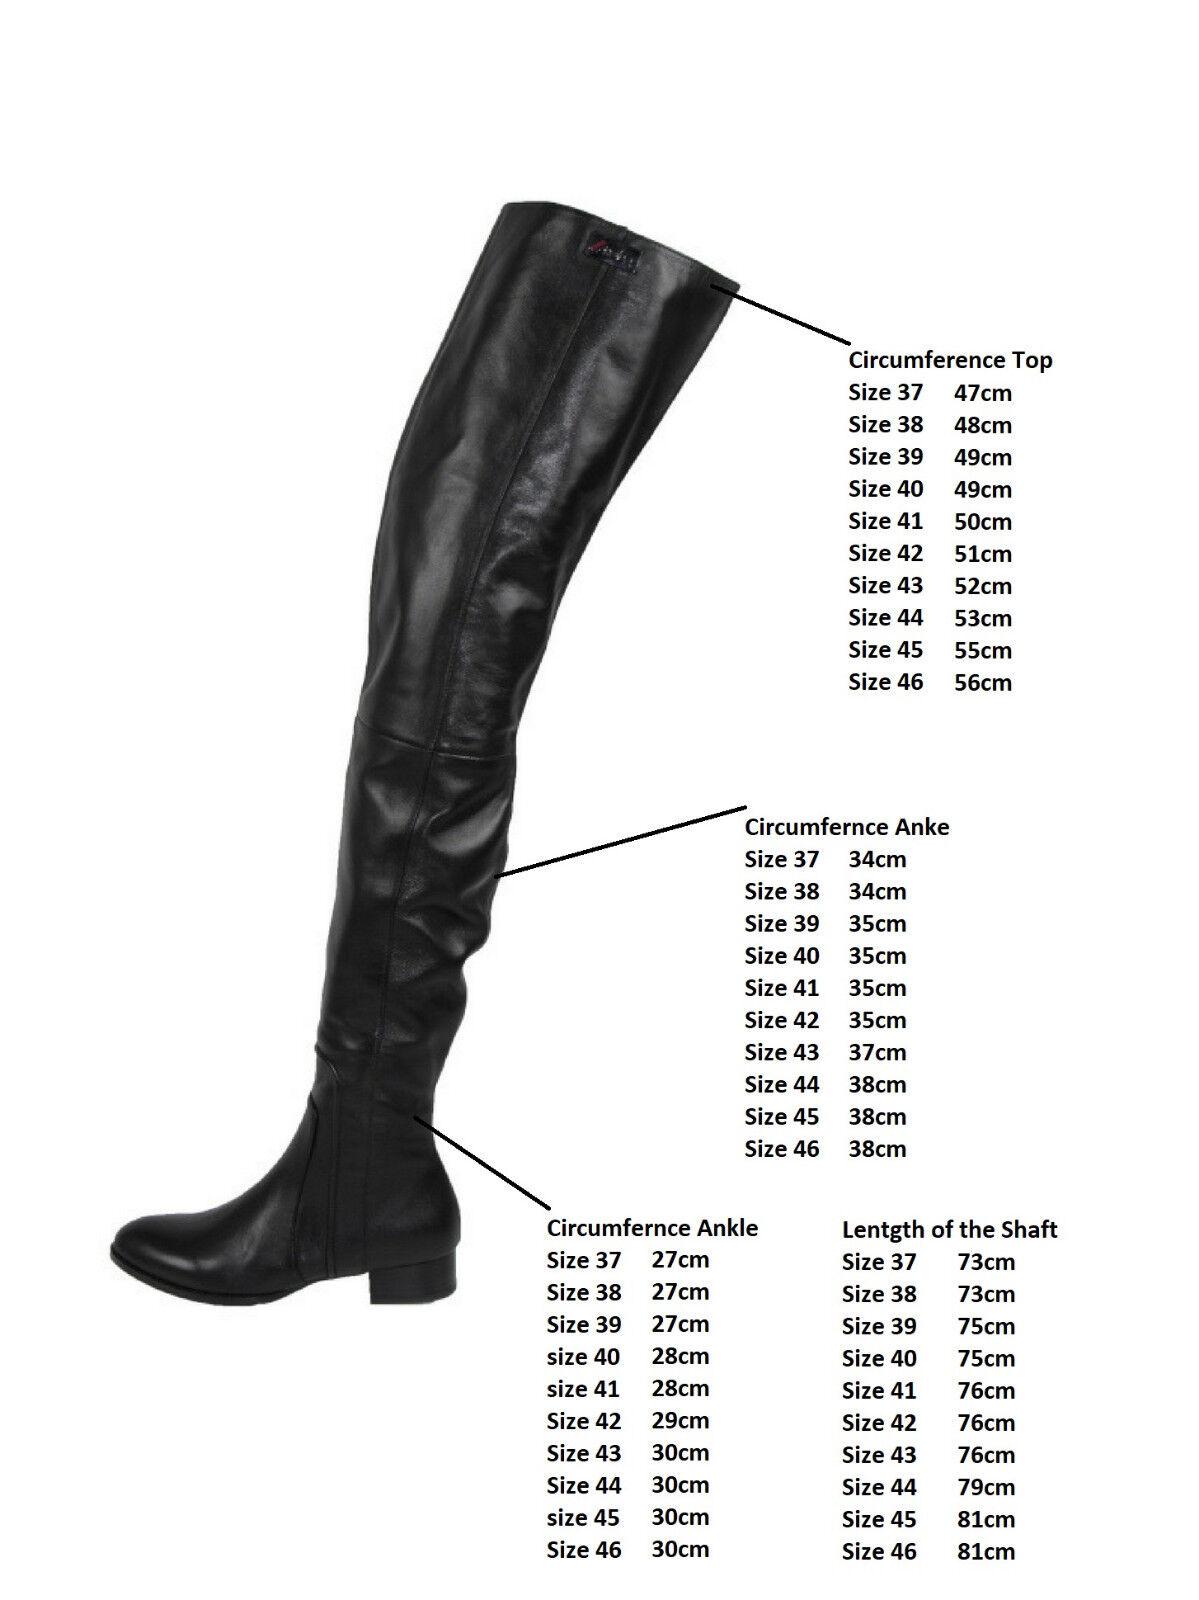 NEU     AROLLO Lange Echtleder Niedrig Heel Overknee Stiefel 37,38,39,40,41,42, f6ce3a